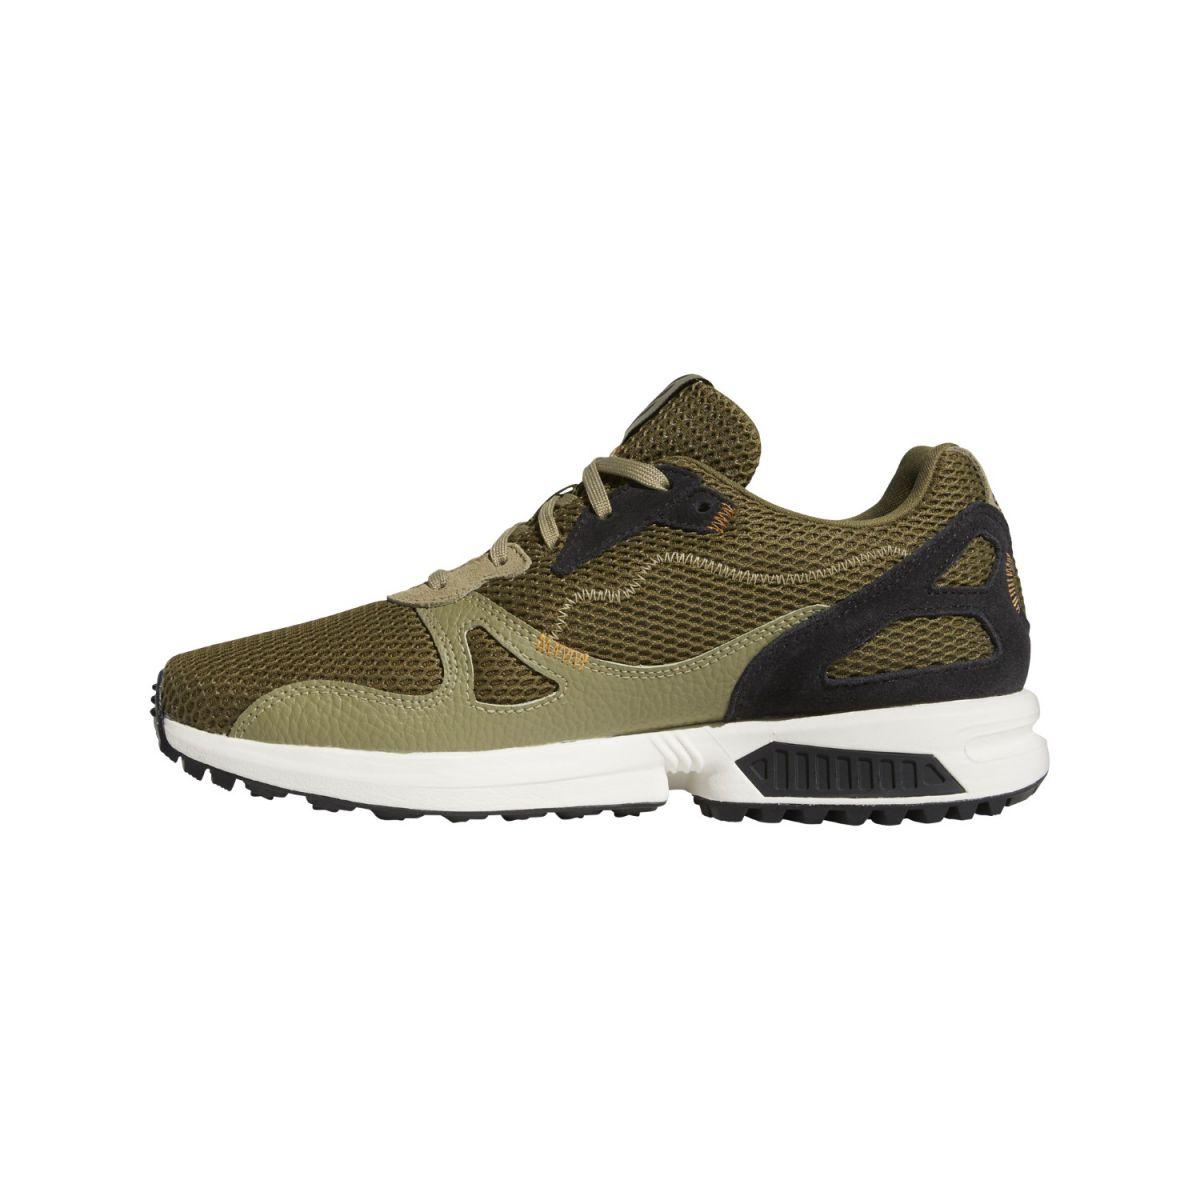 adidas adicross zx primeblue green black 42